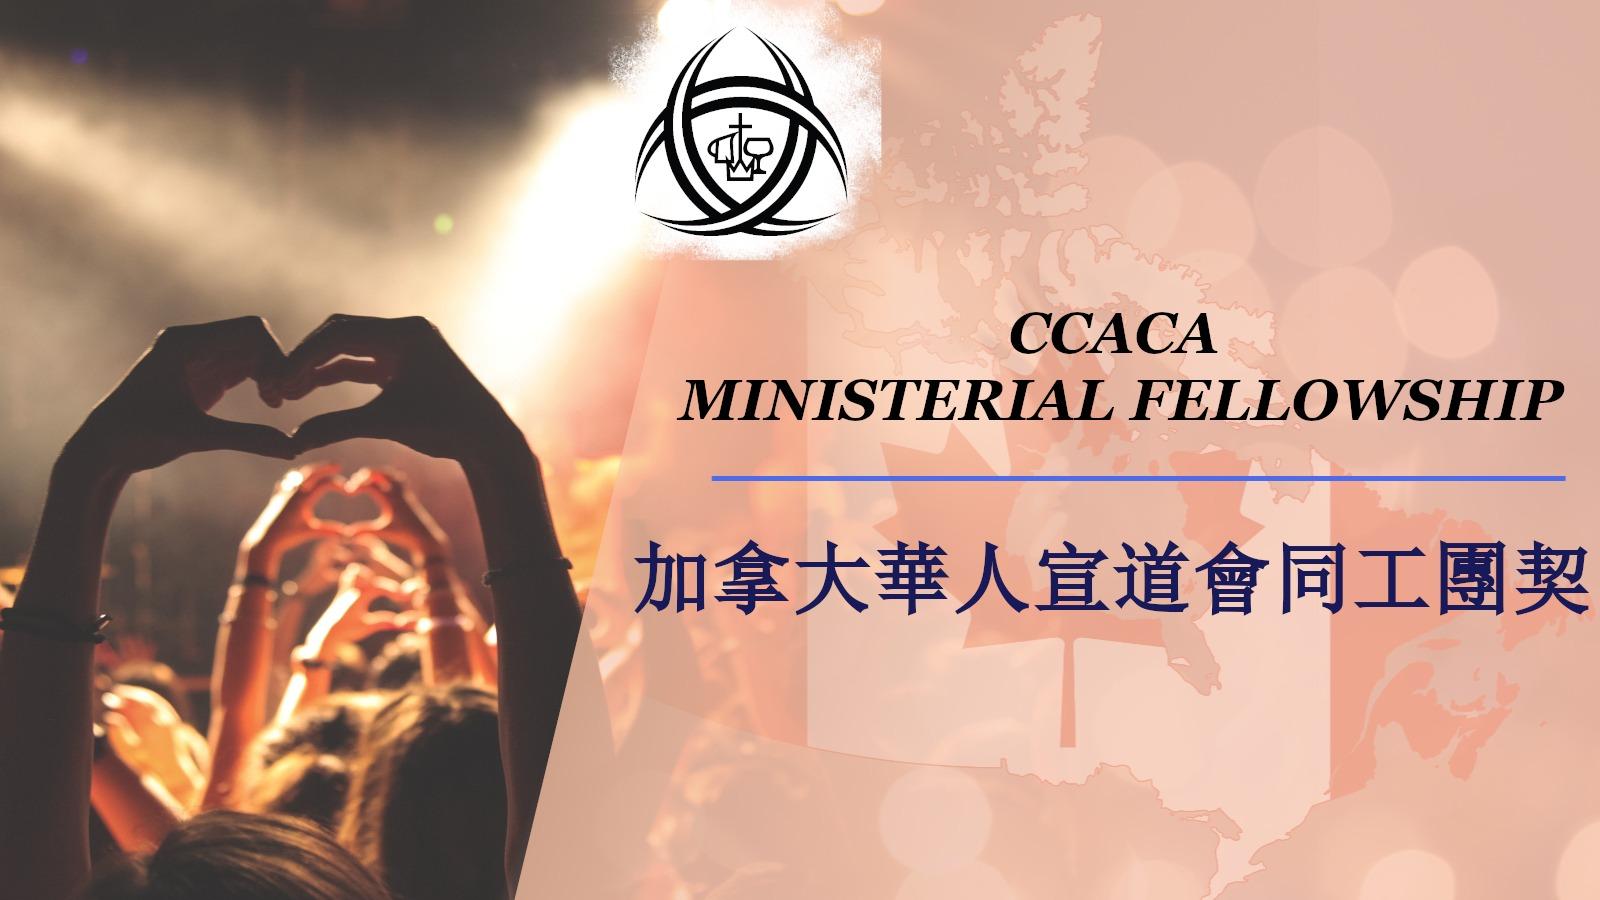 CCACA Ministerial Fellowship